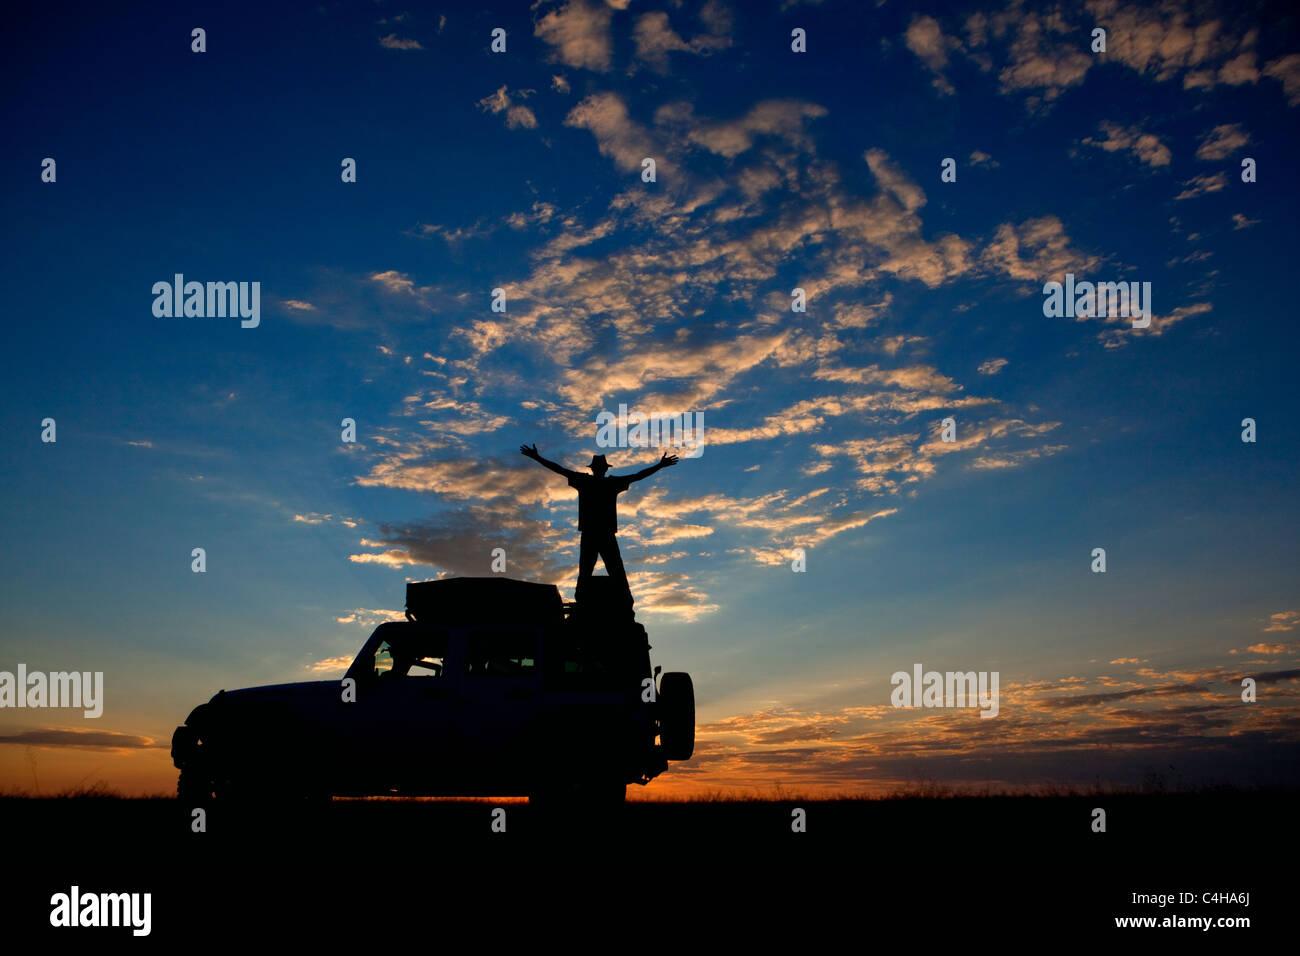 Sunset in Piper Pan, Central Kalahari Game Reserve, Botswana - Stock Image